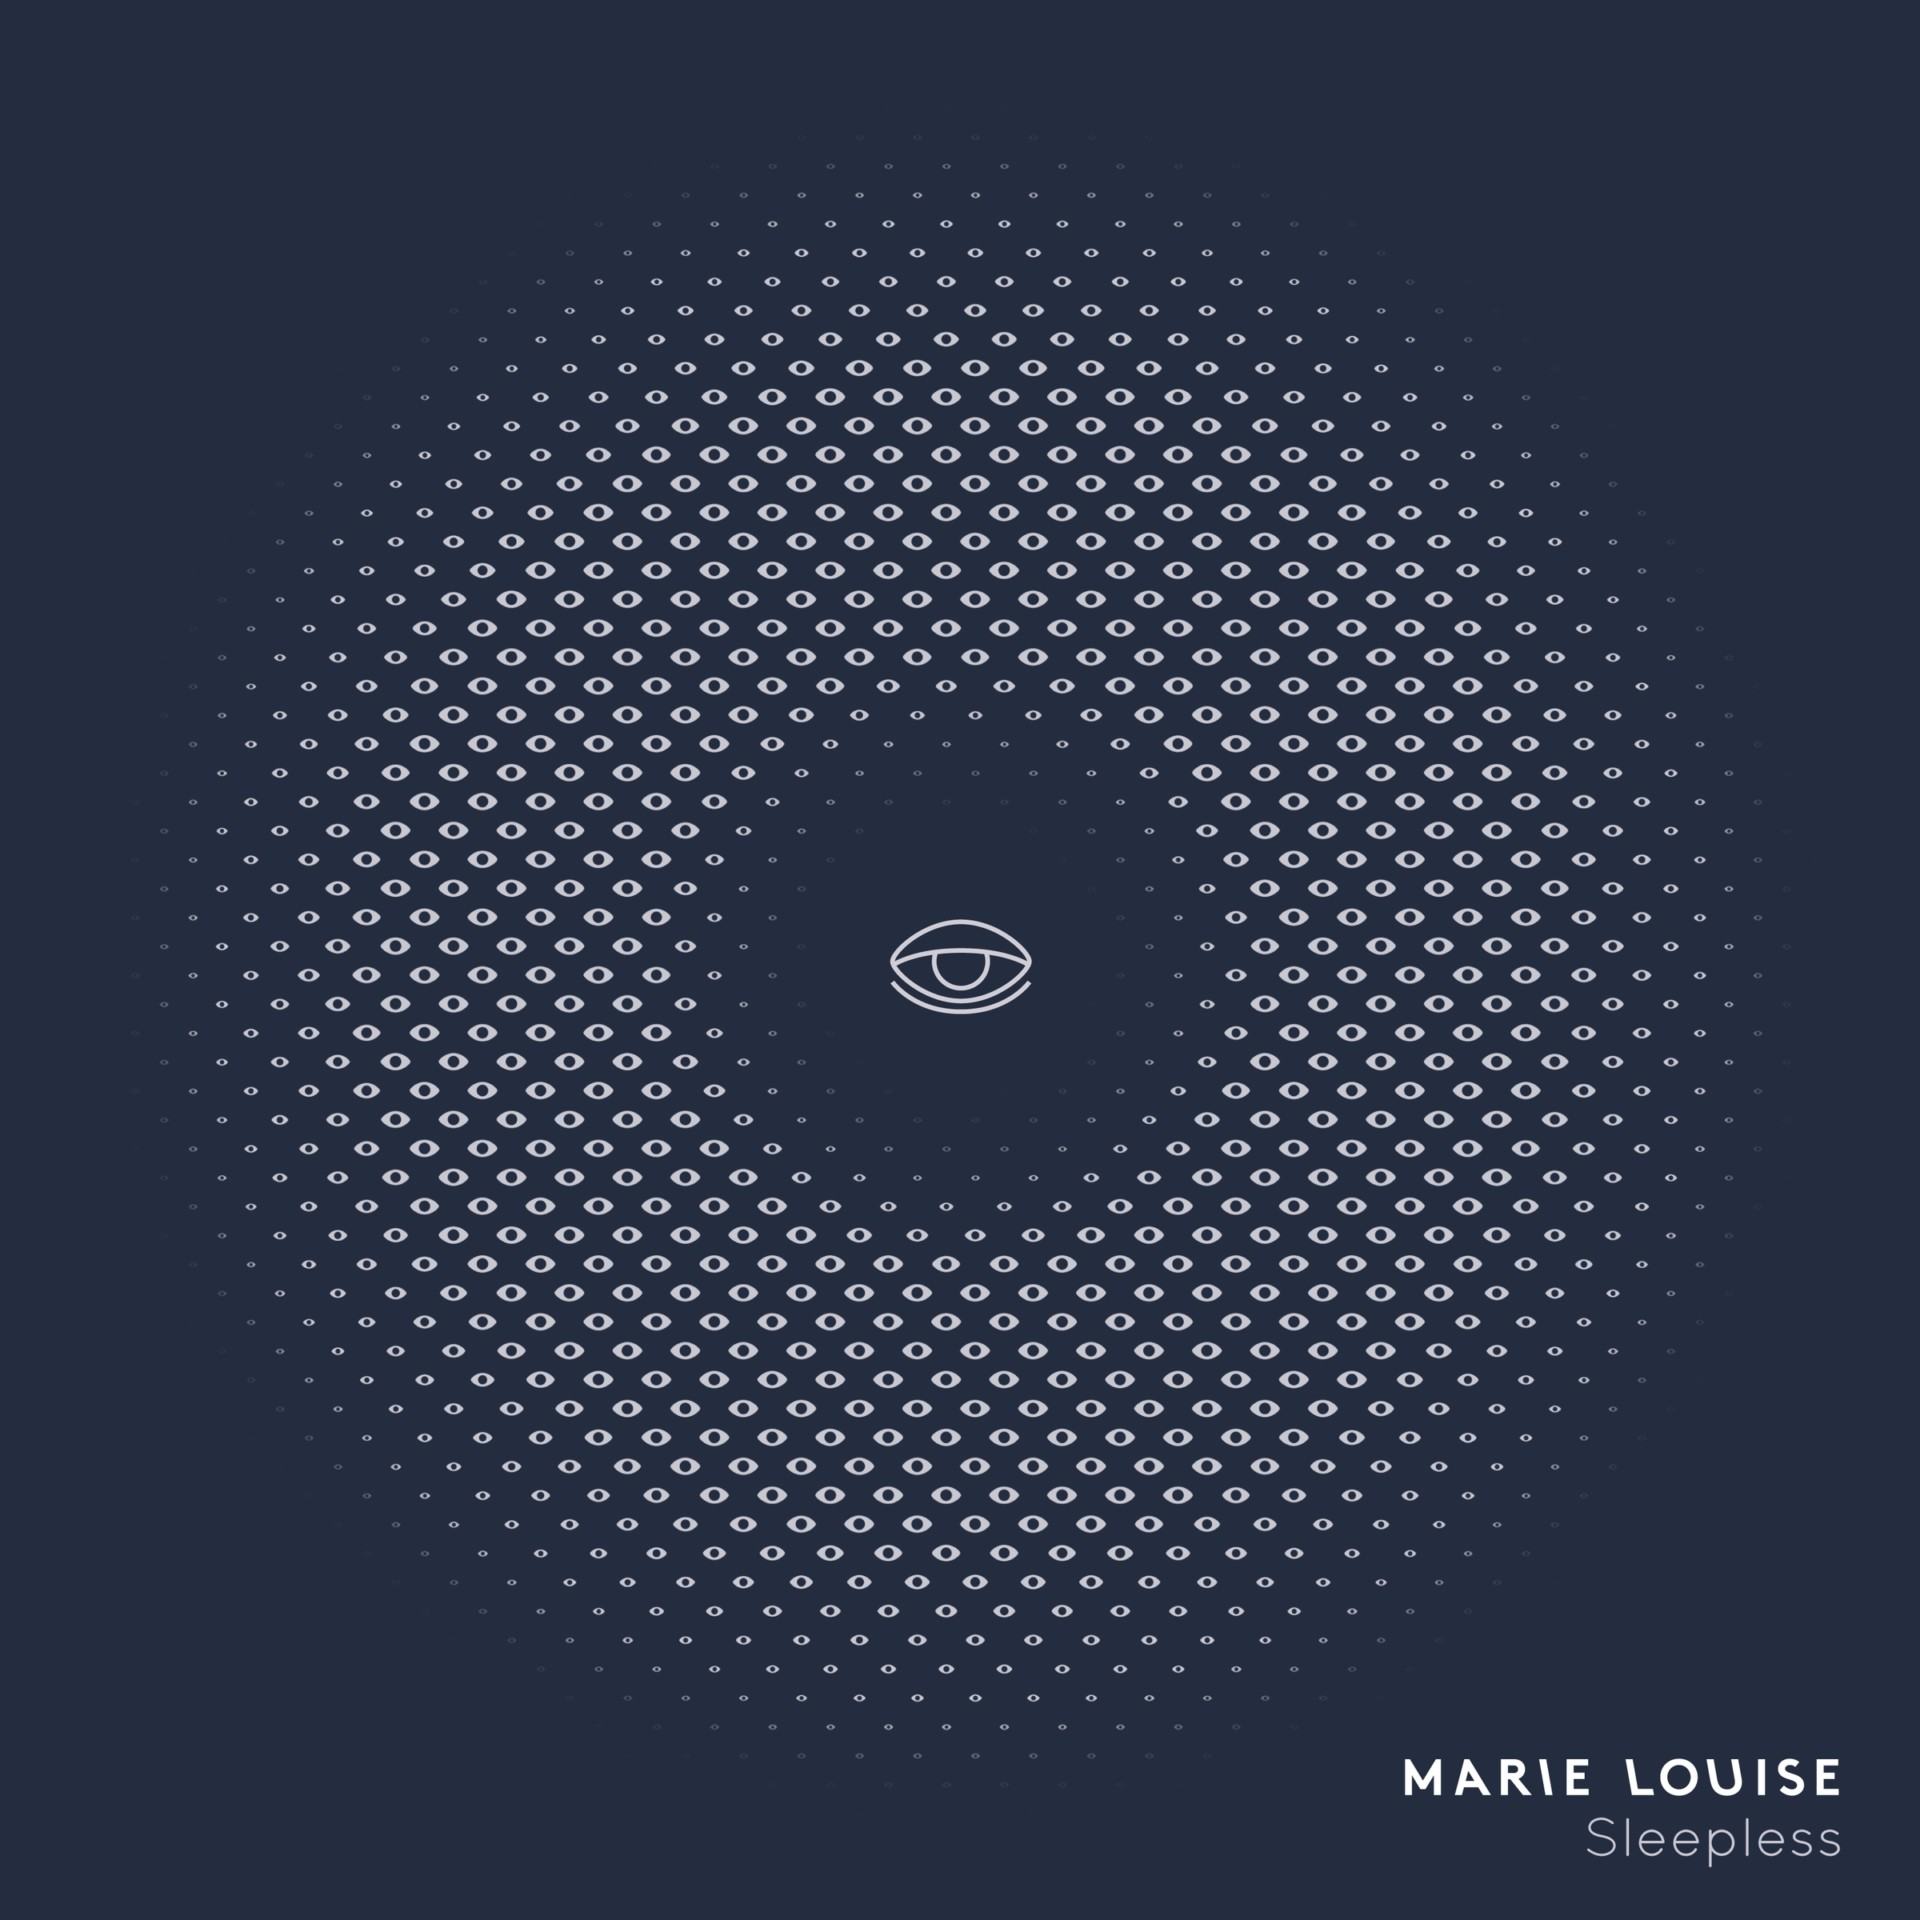 Marielouise Sleepless